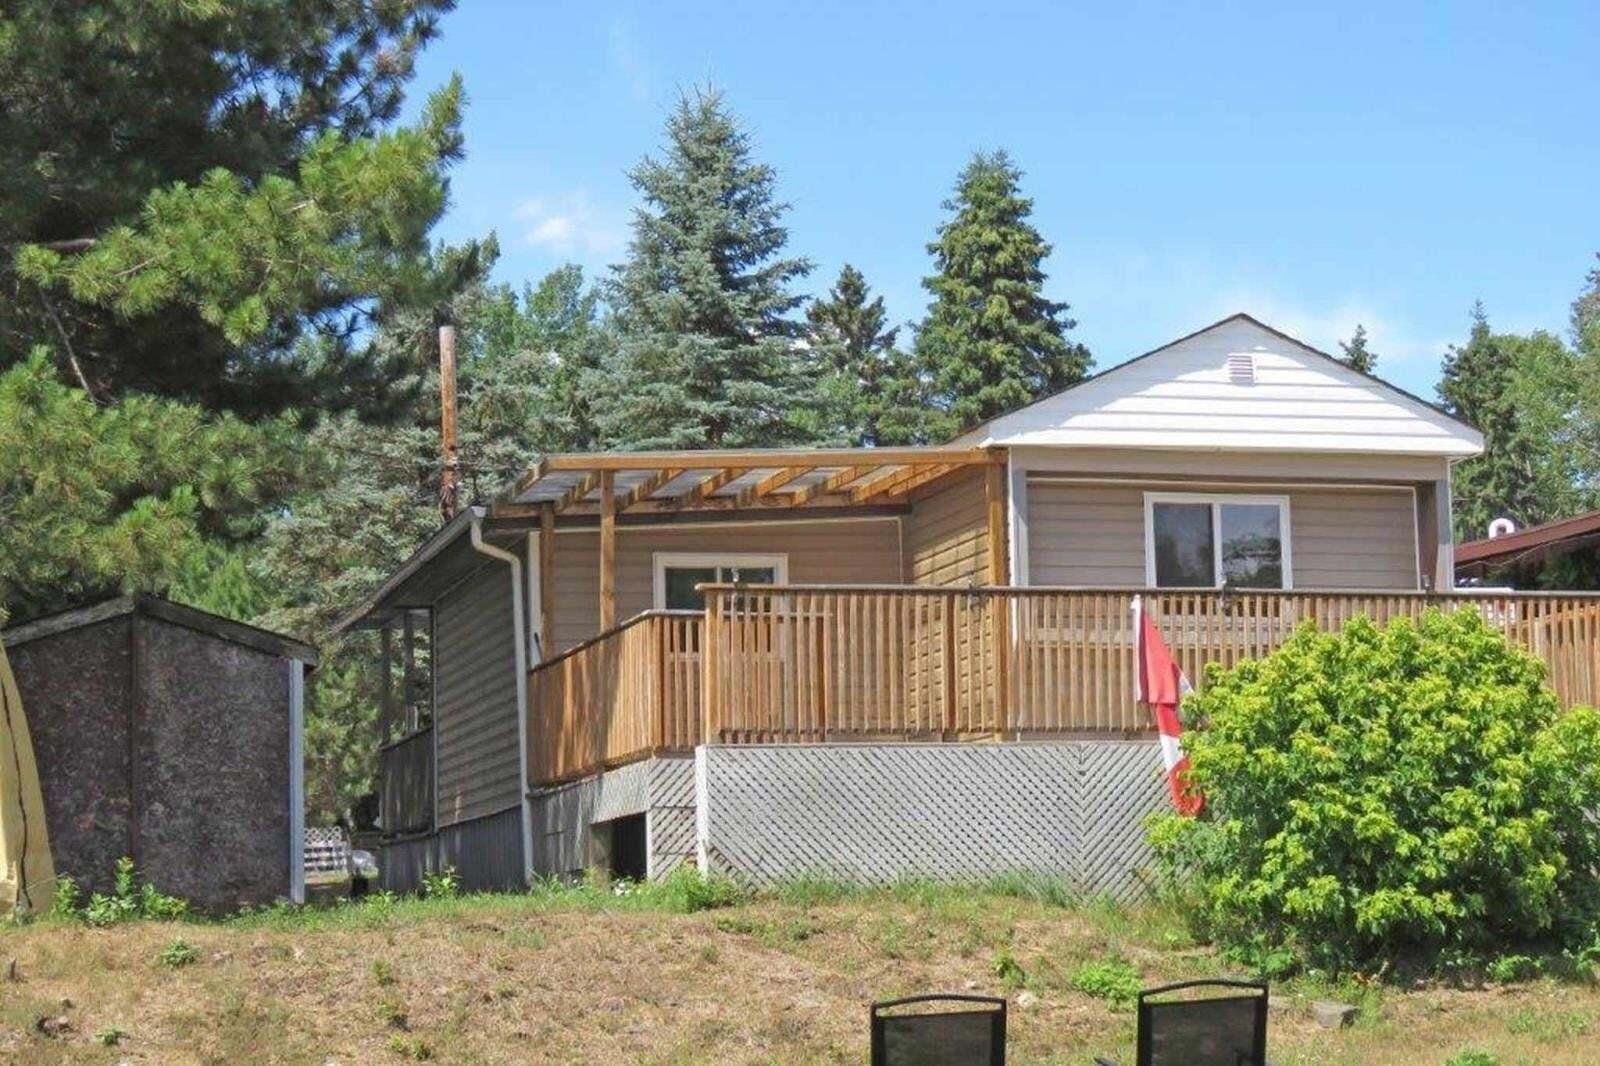 House for sale at 3 Sarawak Dr Shuniah Ontario - MLS: TB201657